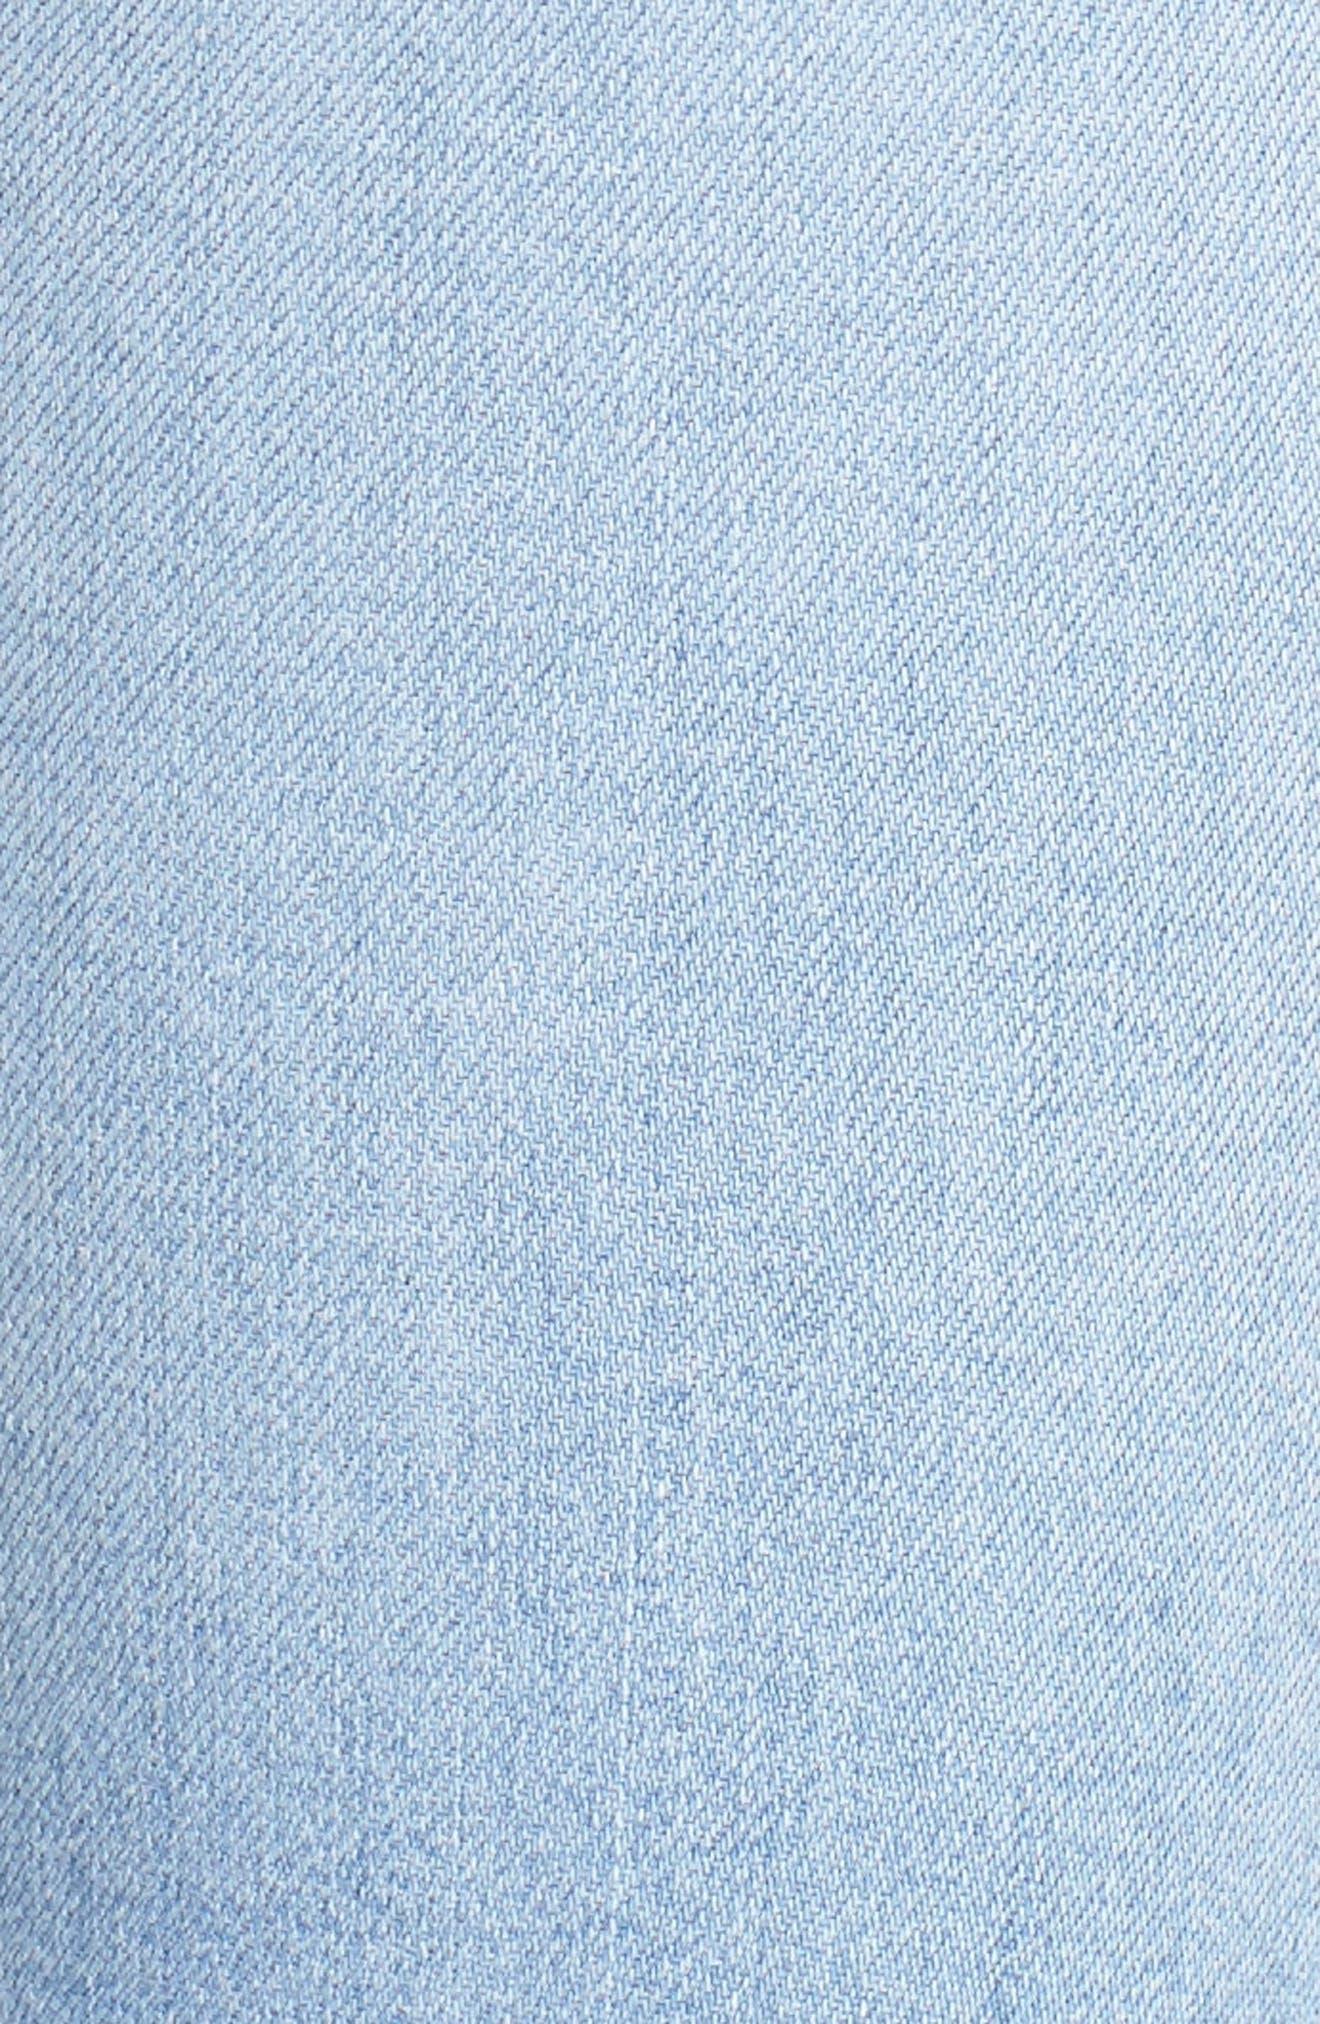 Alternate Image 5  - Hudson Jeans Mia Patchwork Flare Jeans (Royal Delta)